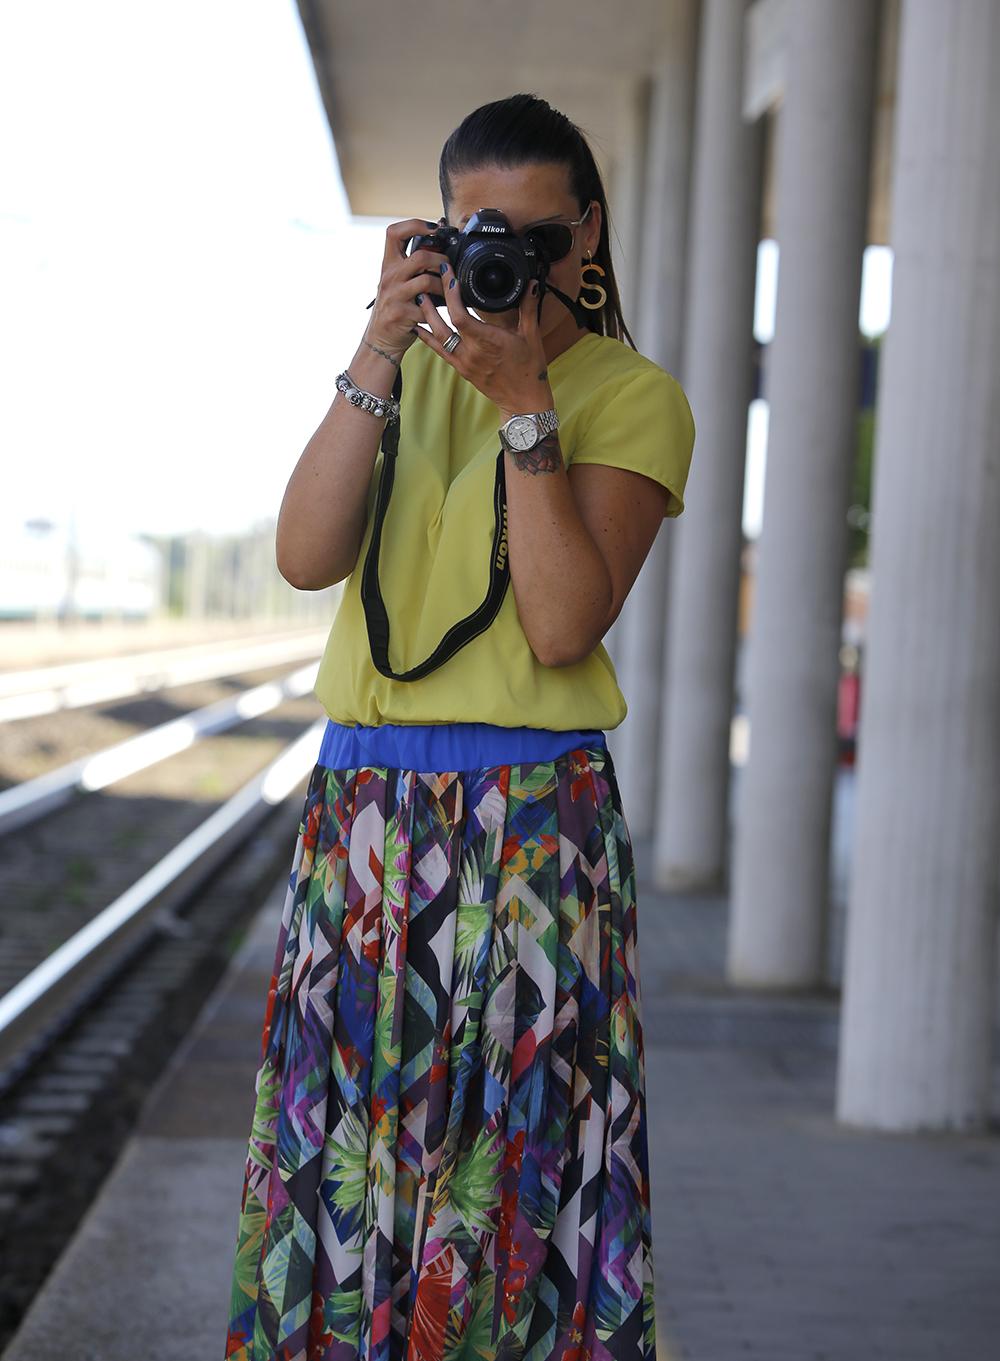 pitti_outfit_momeme_gonna_lunga_pieghe_fantasia_tropic_geometrie_colori_fascia_blu_top_giallo_foto_nikon